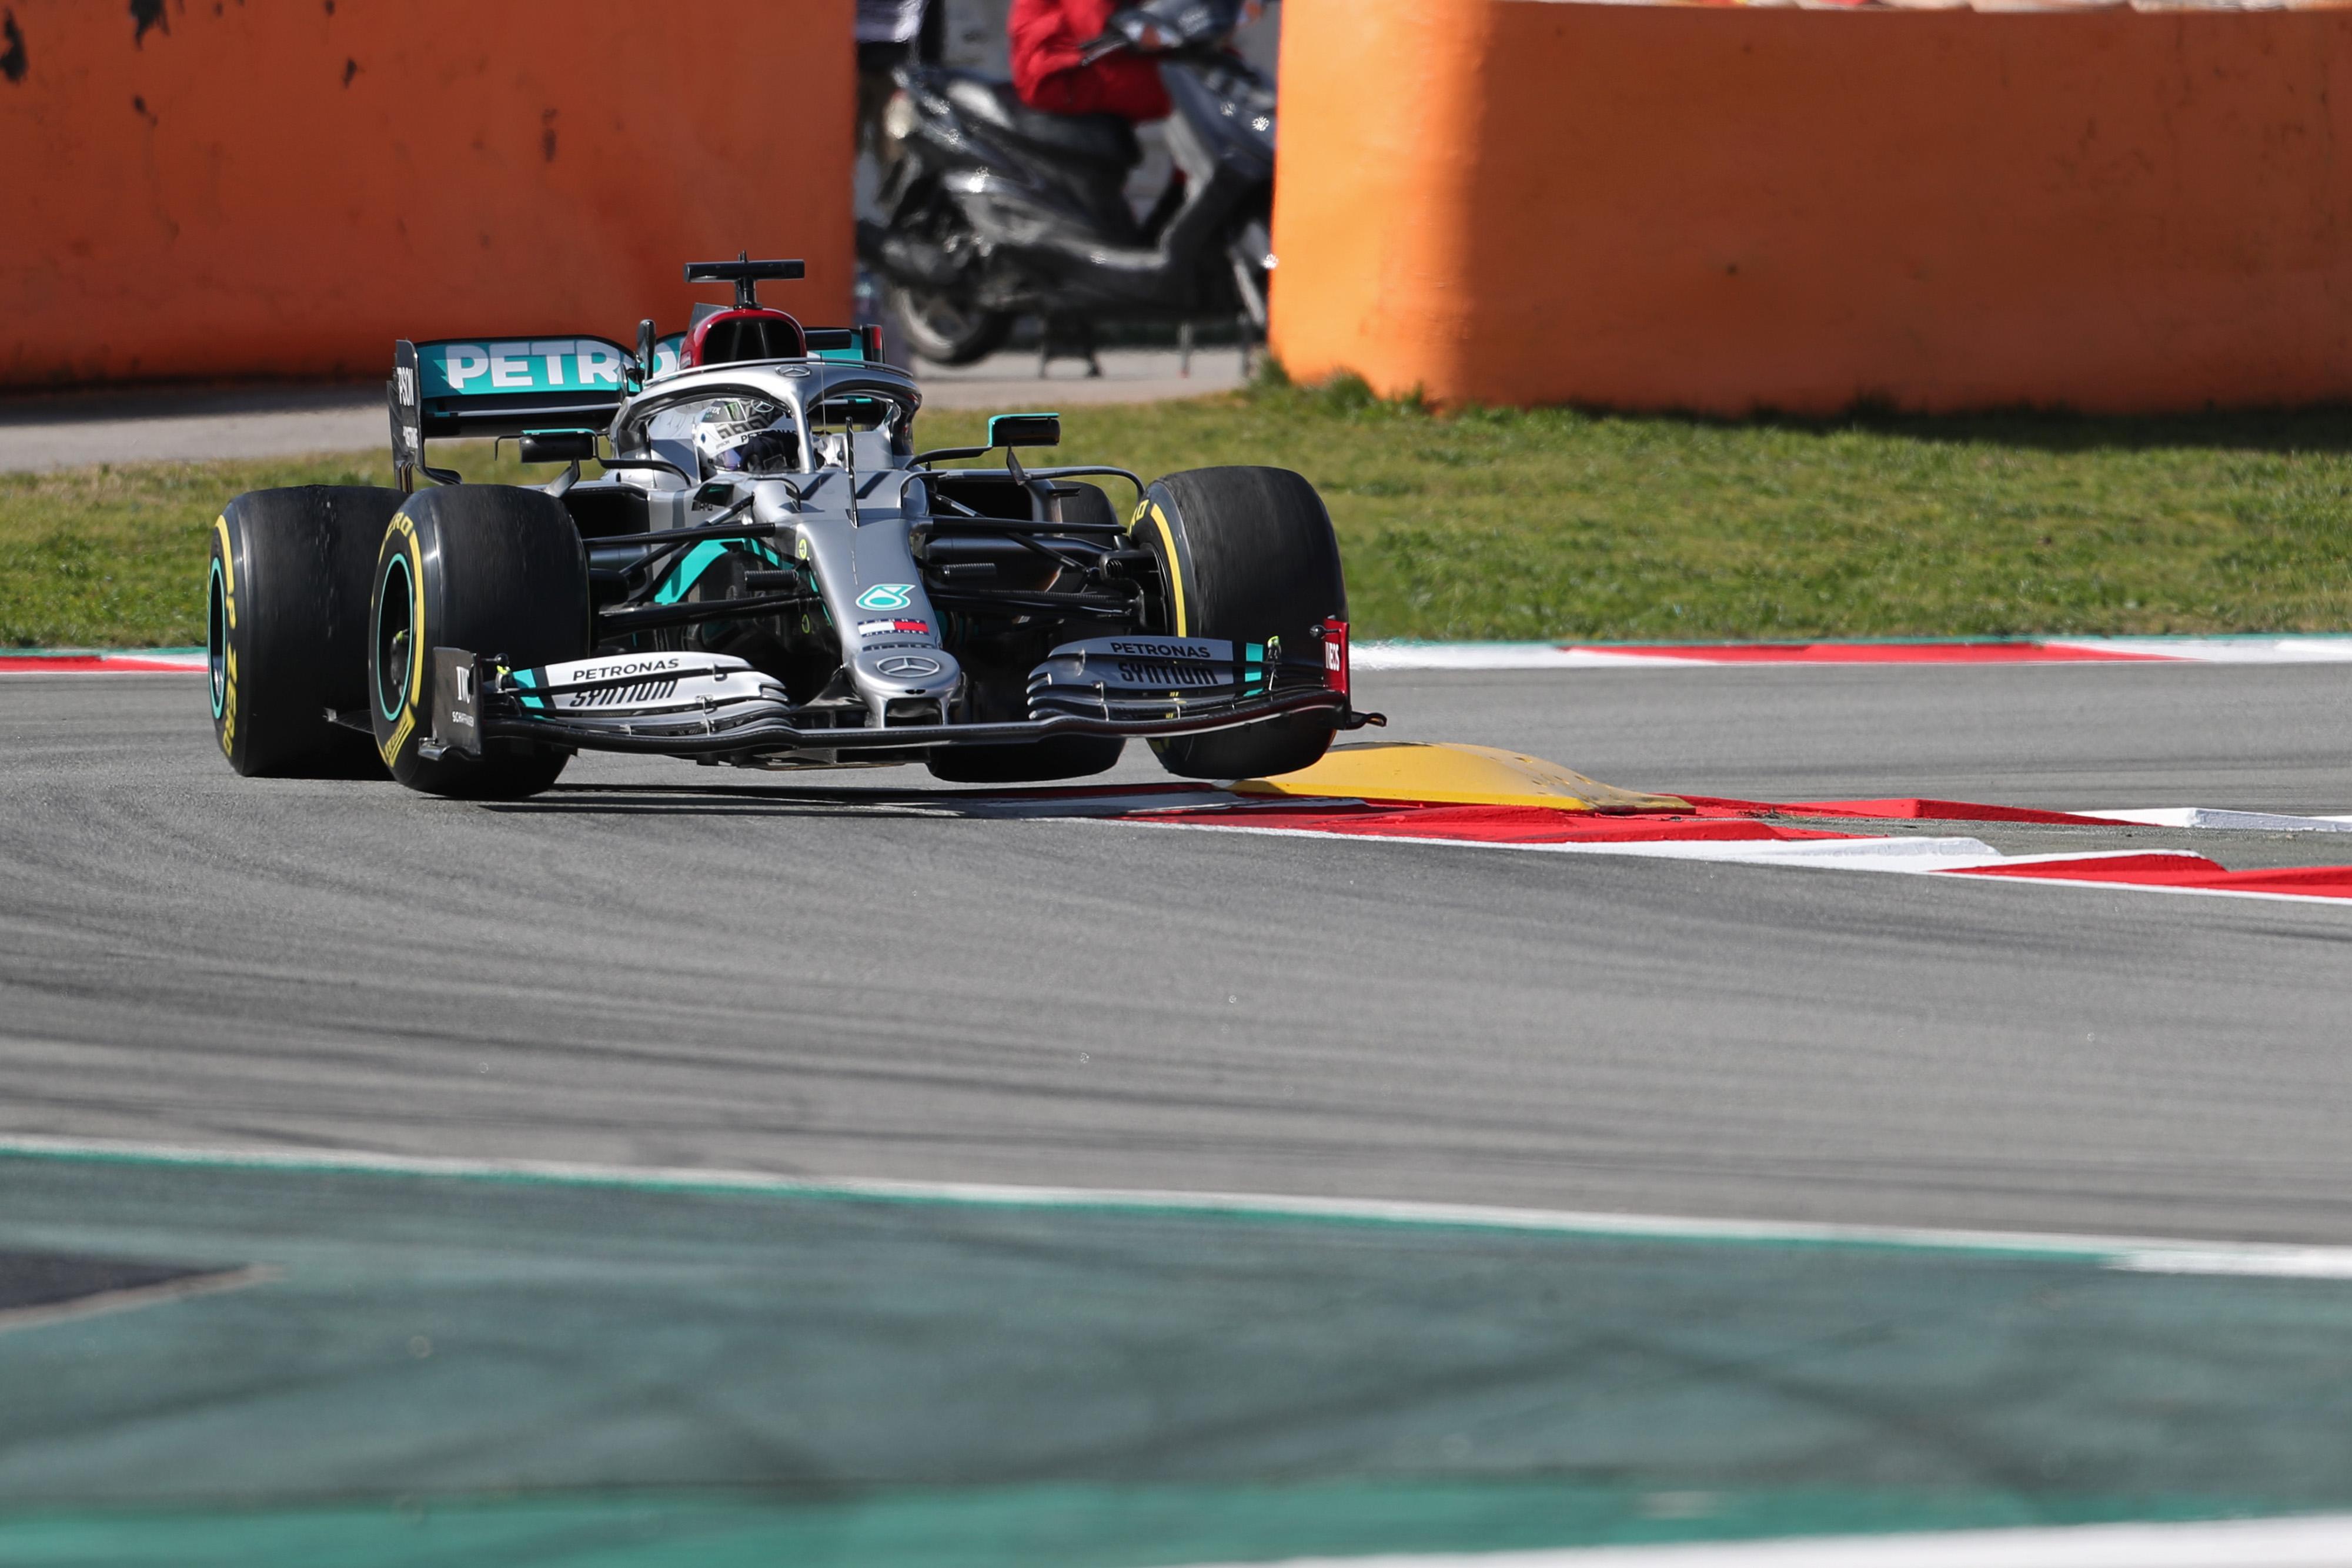 F1 Formula 1 Testing Valtteri Bottas Mercedes Max Verstappen Red bull Racing